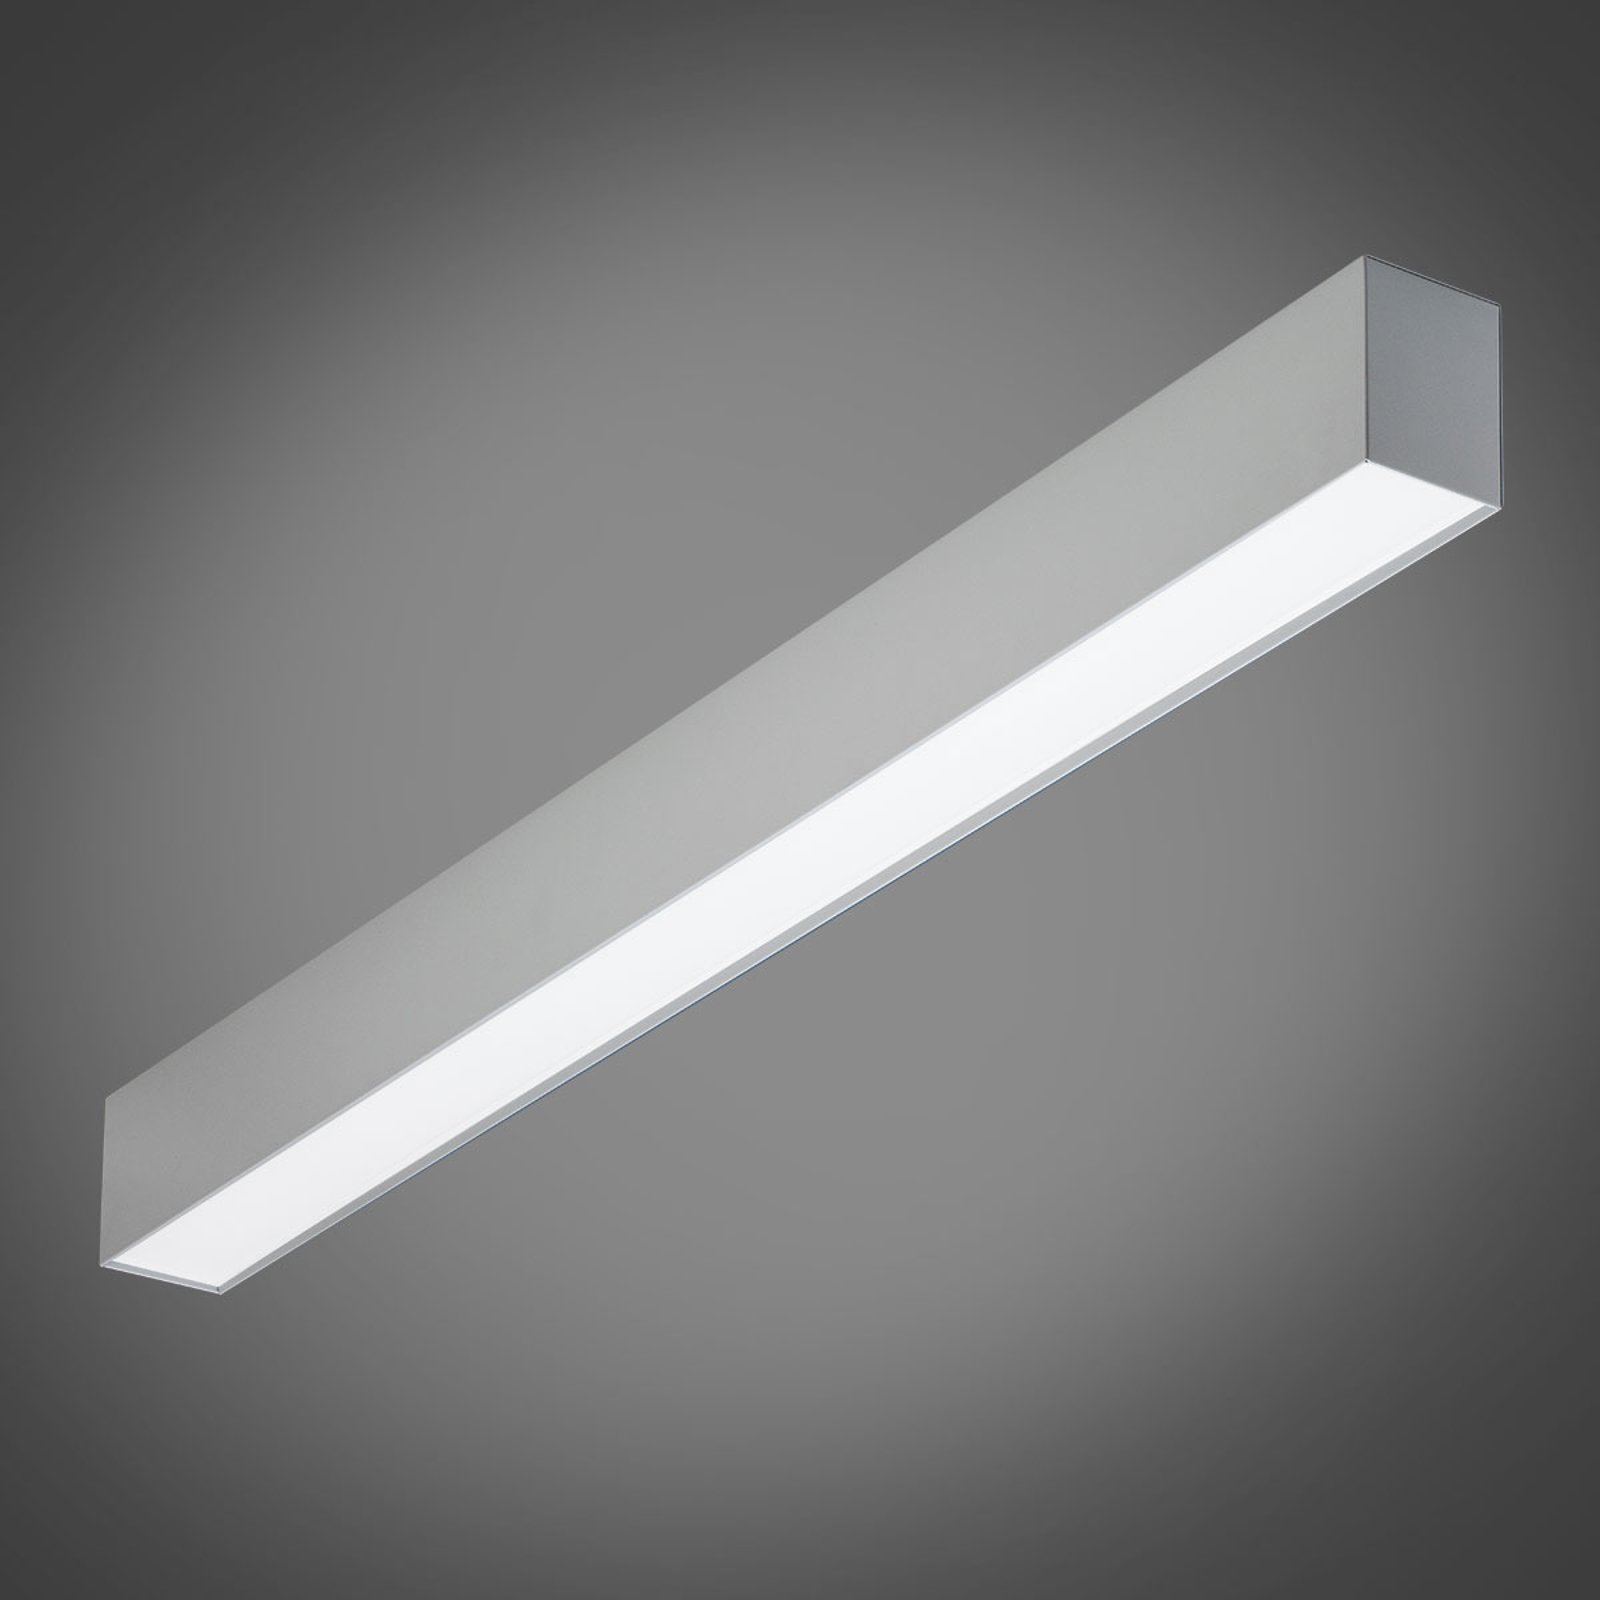 Energieffektiv LED-vegglampe LIPW075, 3 000K